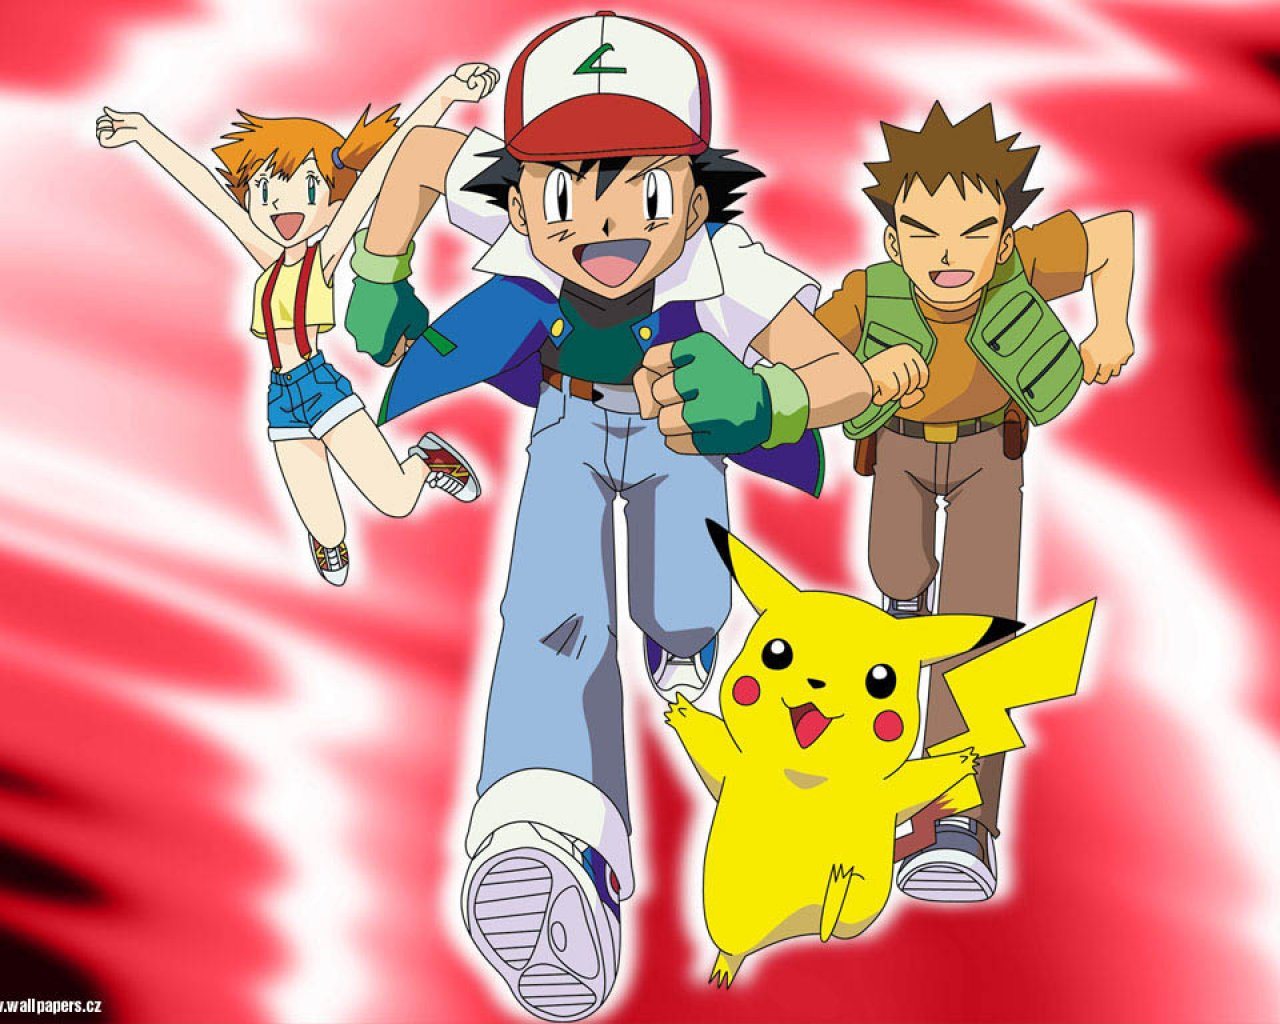 http://4.bp.blogspot.com/-hp7mYOziXB0/Tf0dNeApkgI/AAAAAAAAEqA/9E7tkiHmUZM/s1600/papel_de_parede_de_desenho_animado_pokemon-32381.jpg